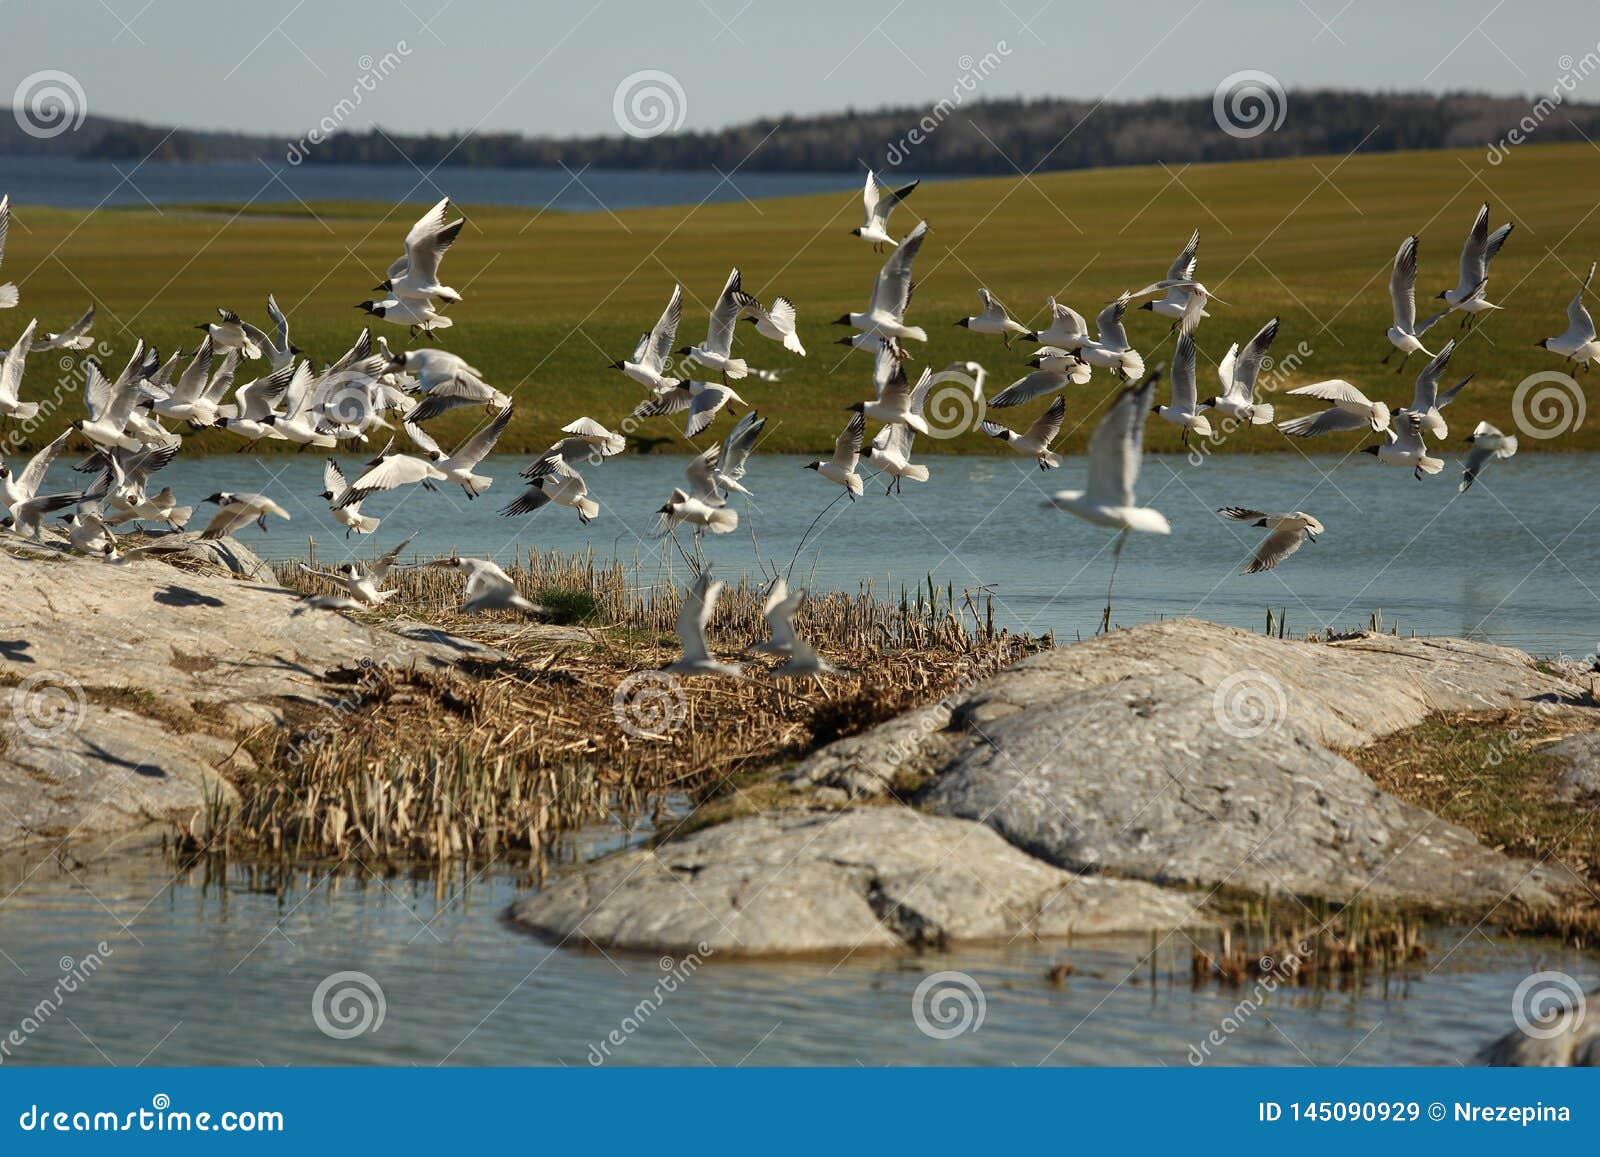 Birds fly over the golf course